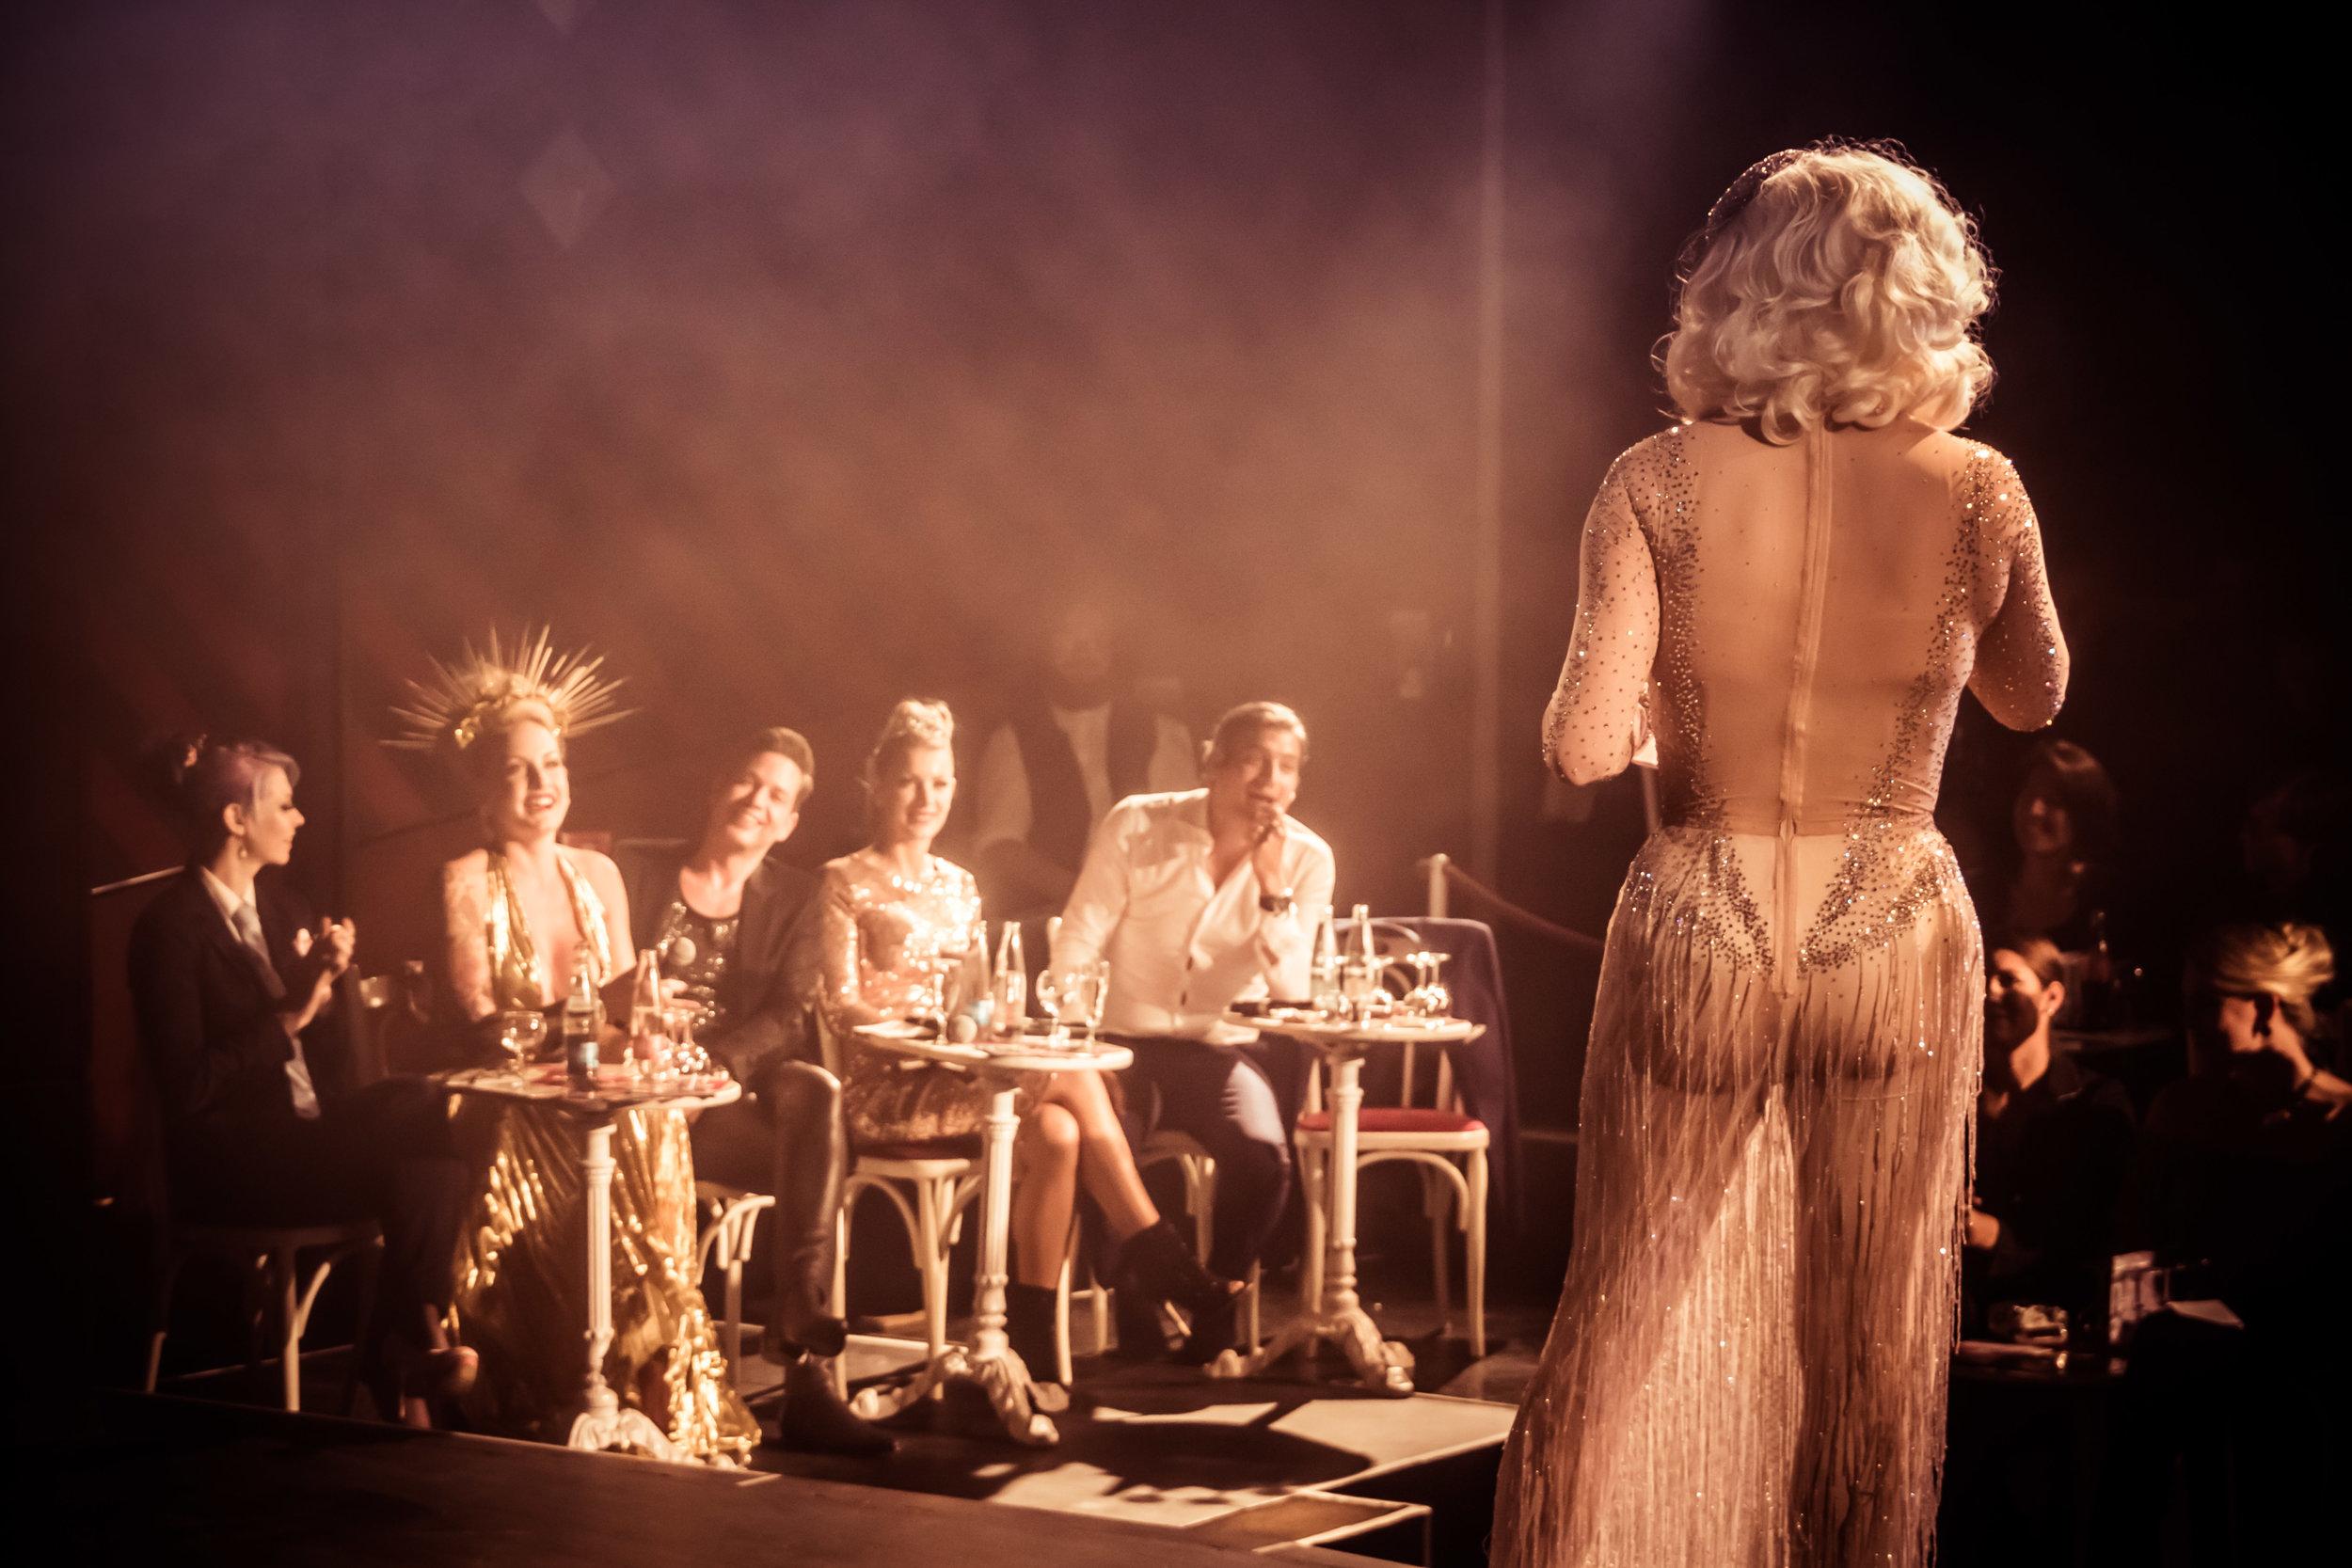 Swiss Burlesque Festival 2018 by Dirk Behlau-3815.jpg